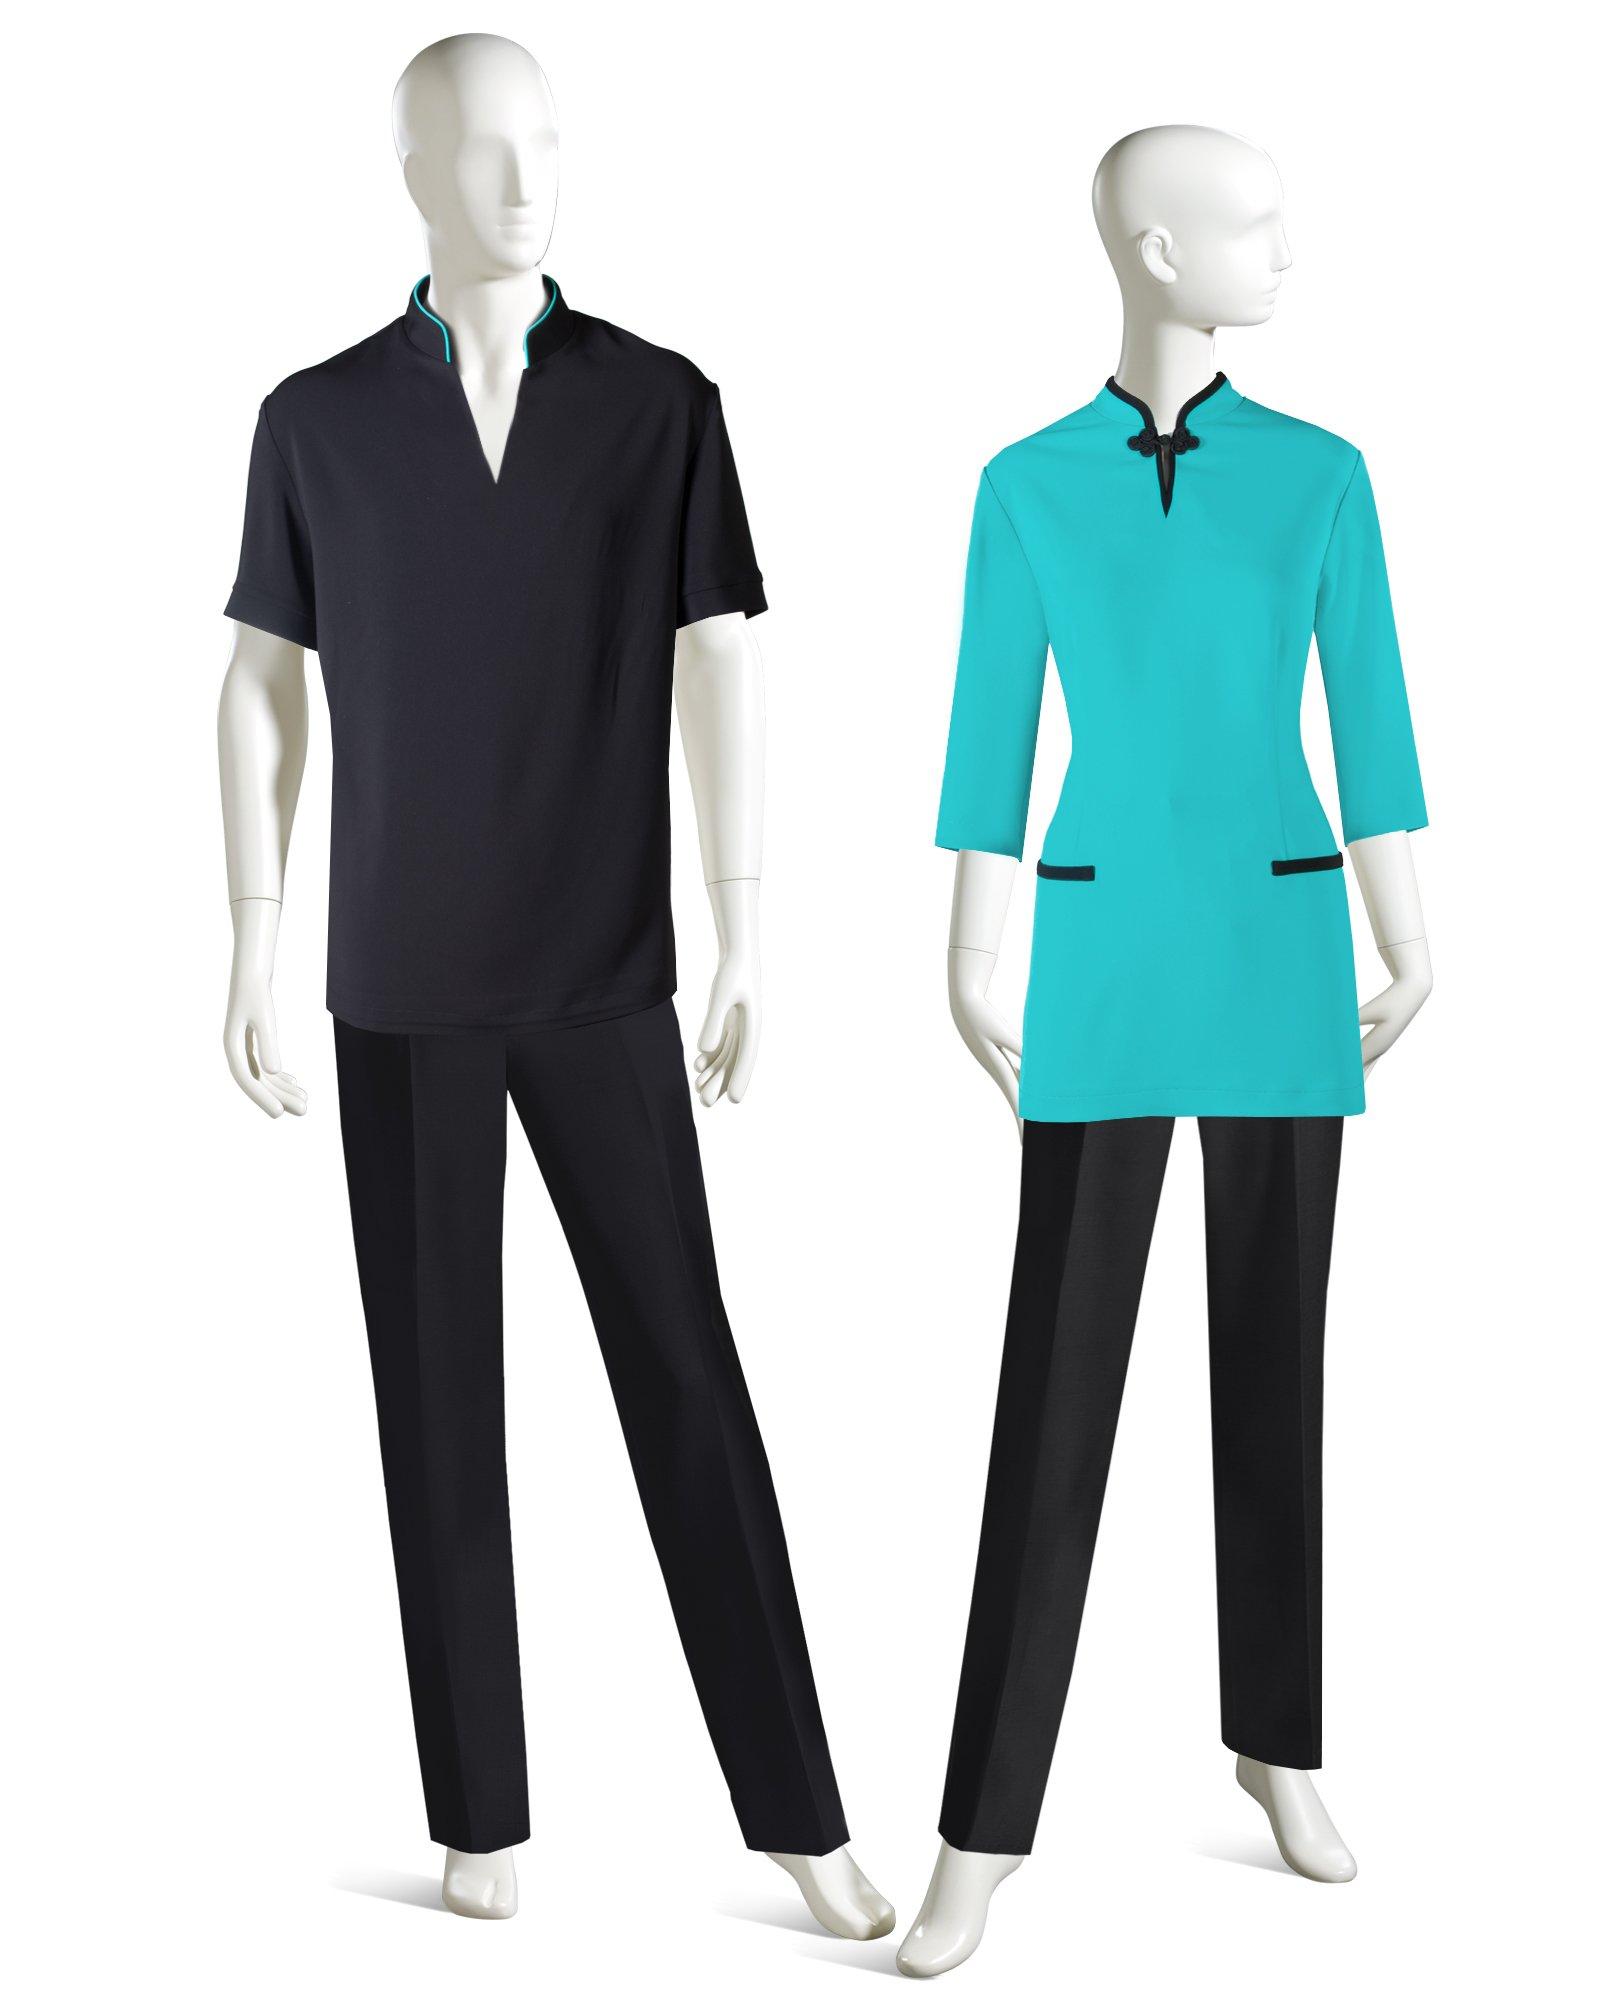 Sp147 for Spa uniform patterns